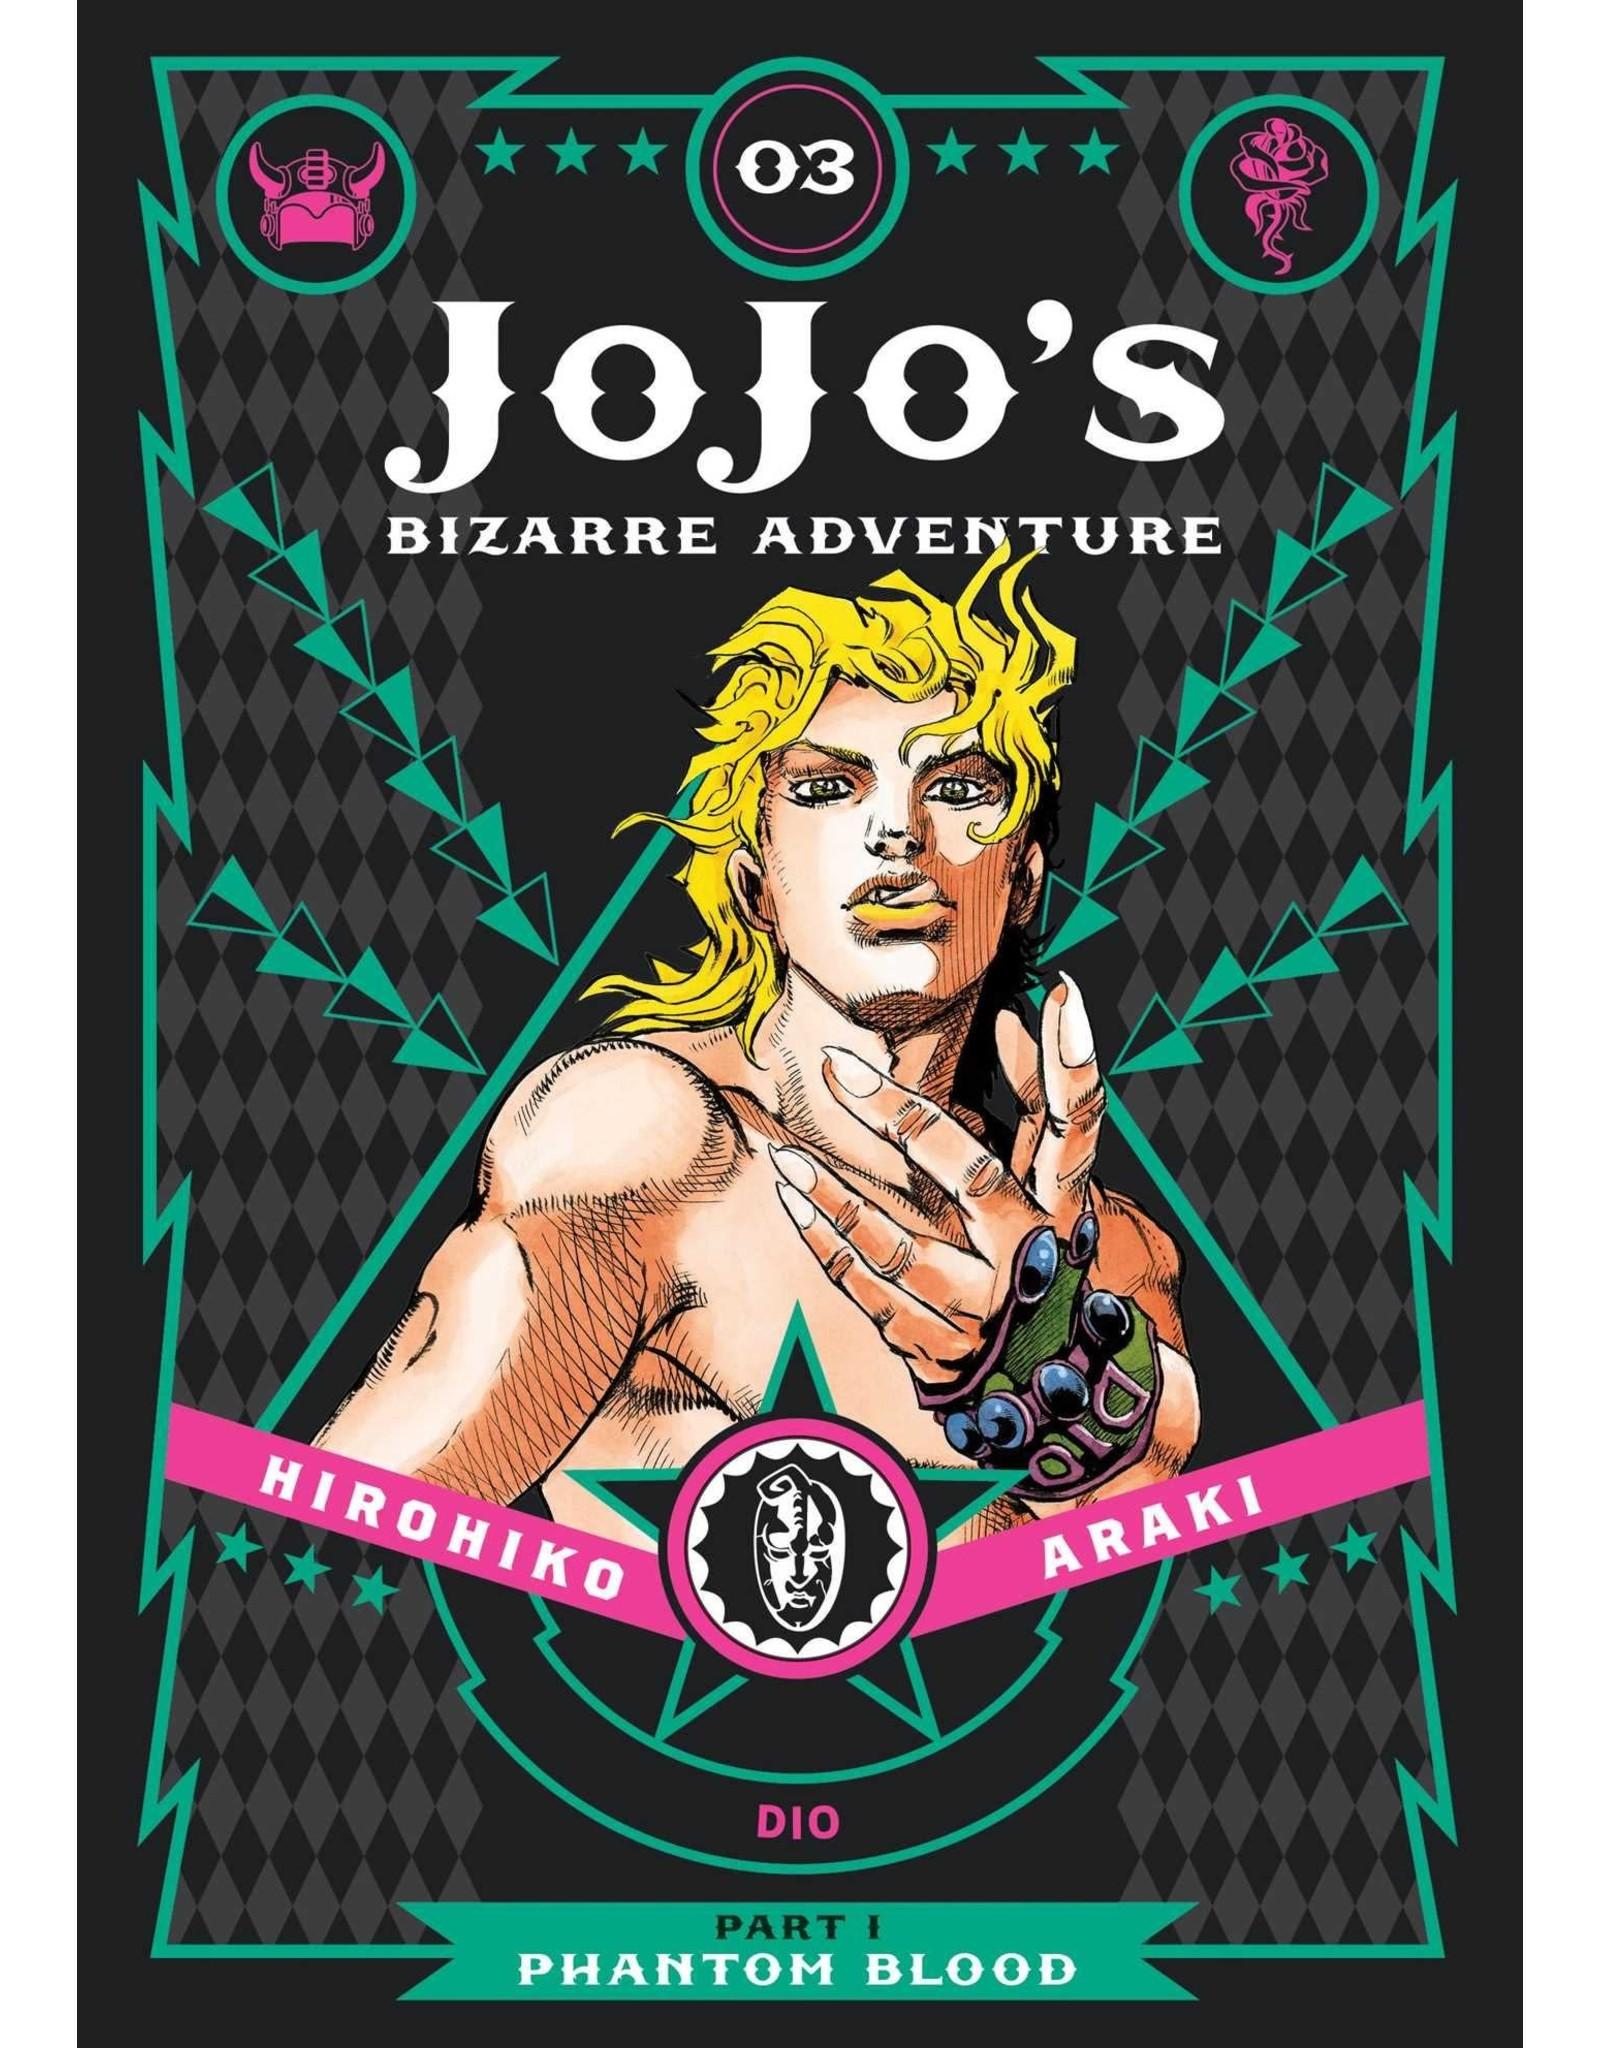 Jojo's Bizarre Adventure - Part 1: Phantom Blood - Volume 3 - Hardcover (Engelstalig)